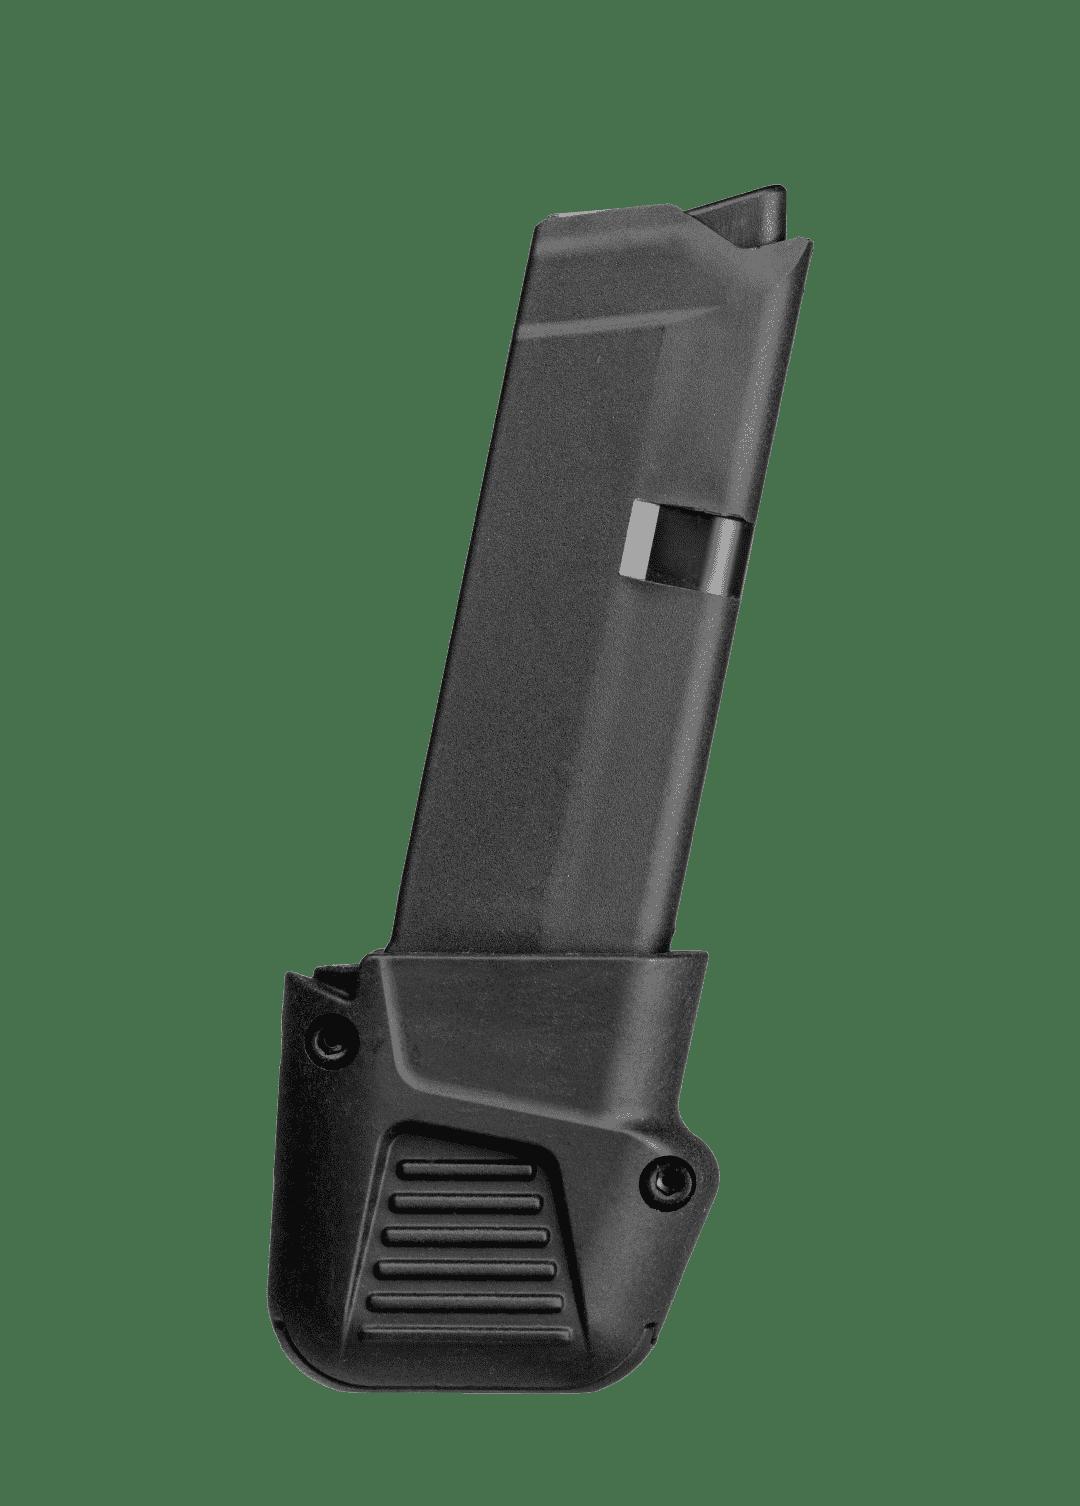 42-10 FAB Defense +4 Magazine Extension for Glock 42 - ZFI-Inc